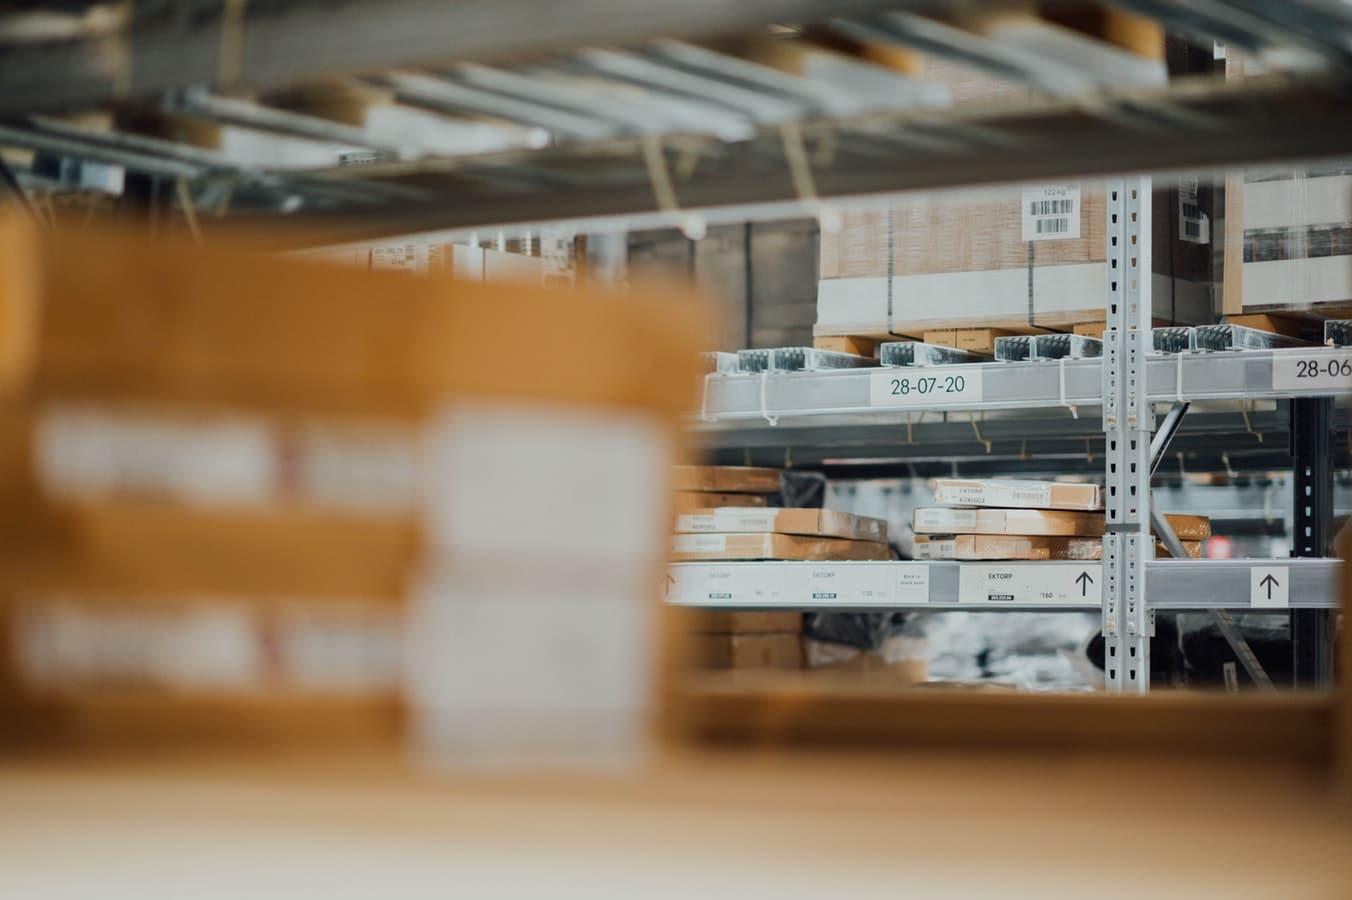 Cartons rangés dans les rayons d'un entrepôt logistique